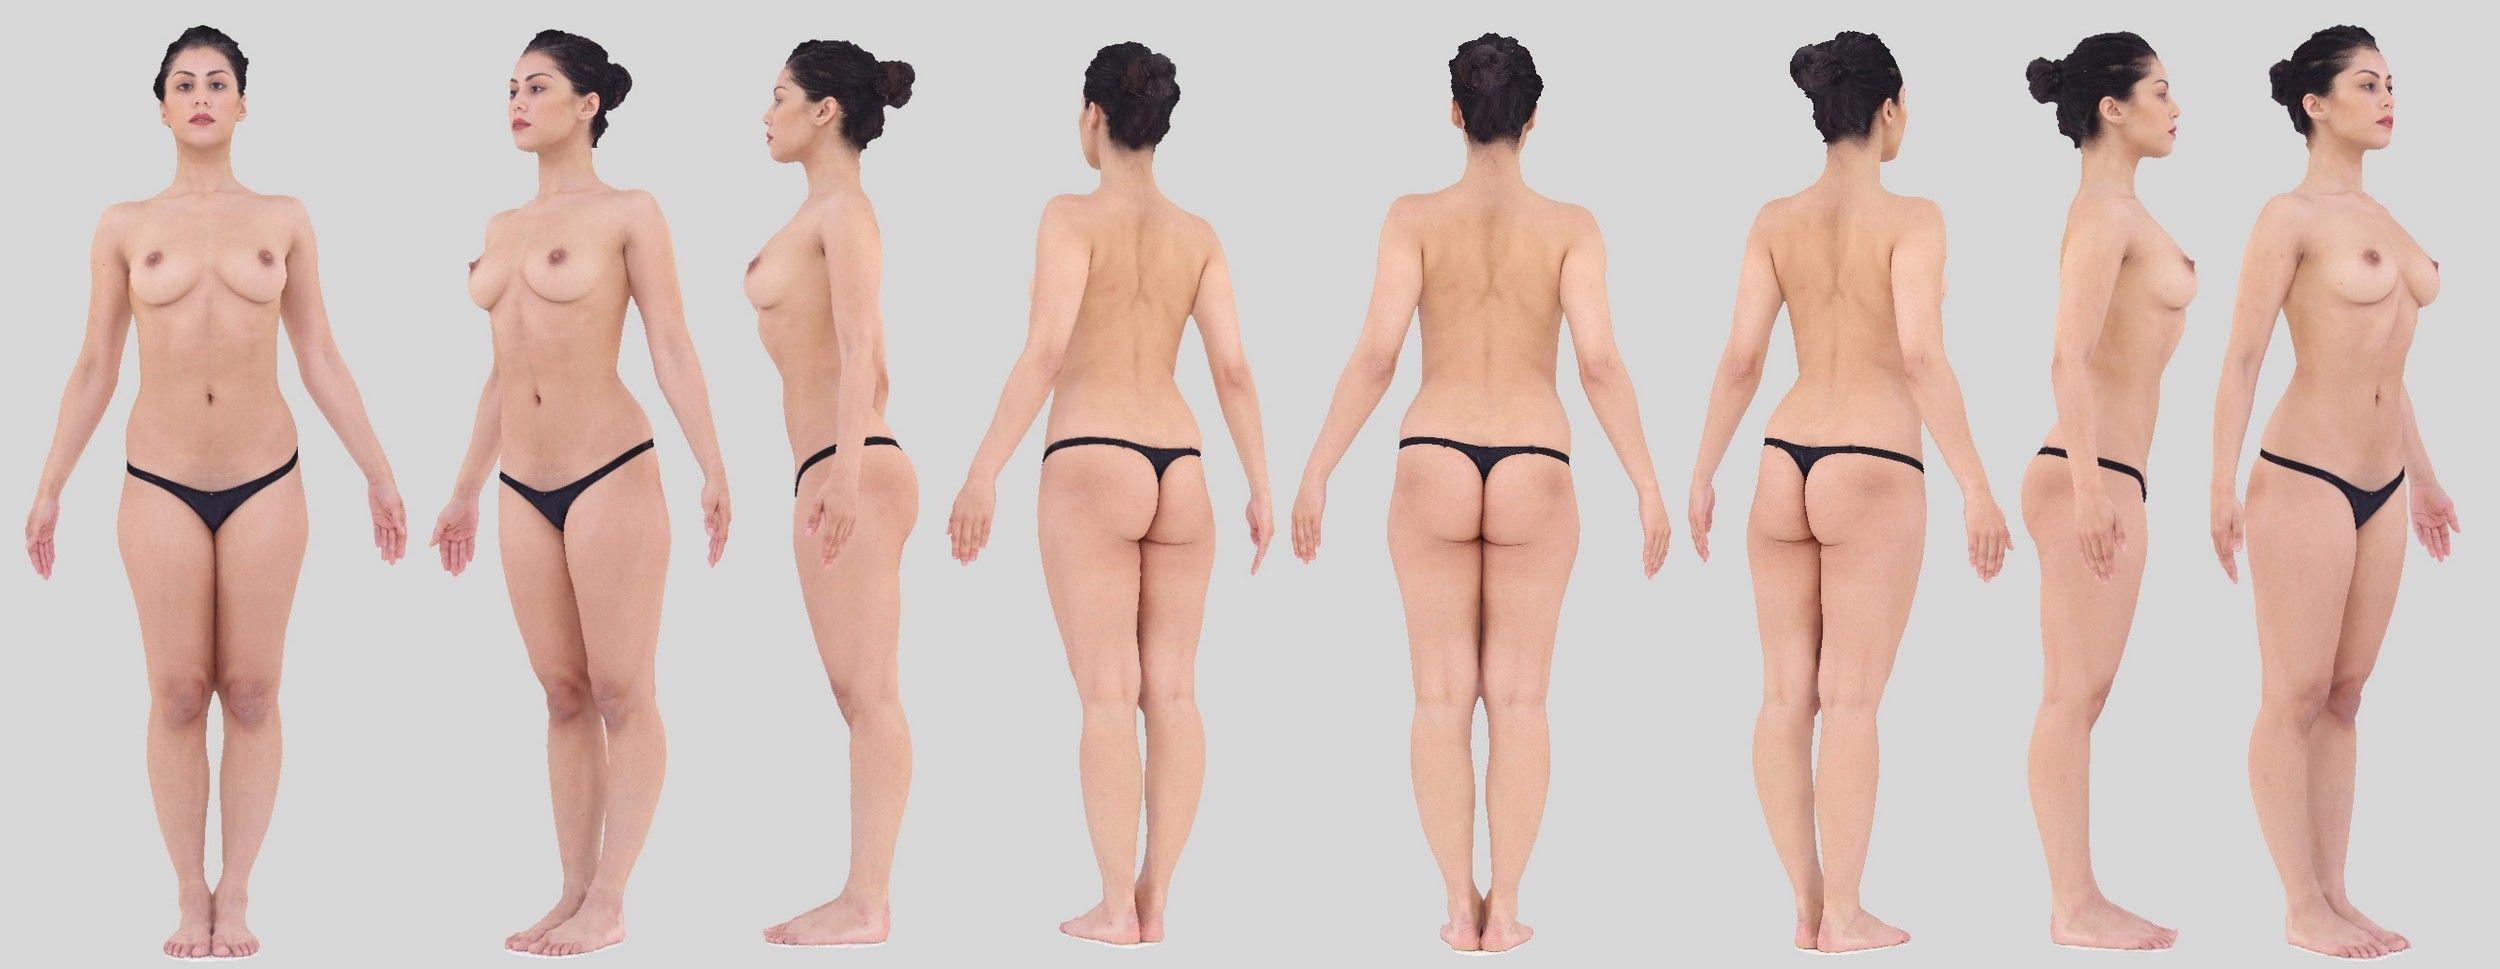 Athena³ Standing Pose001 - 3D Scans   Anatomy   Pinterest   Anatomy ...